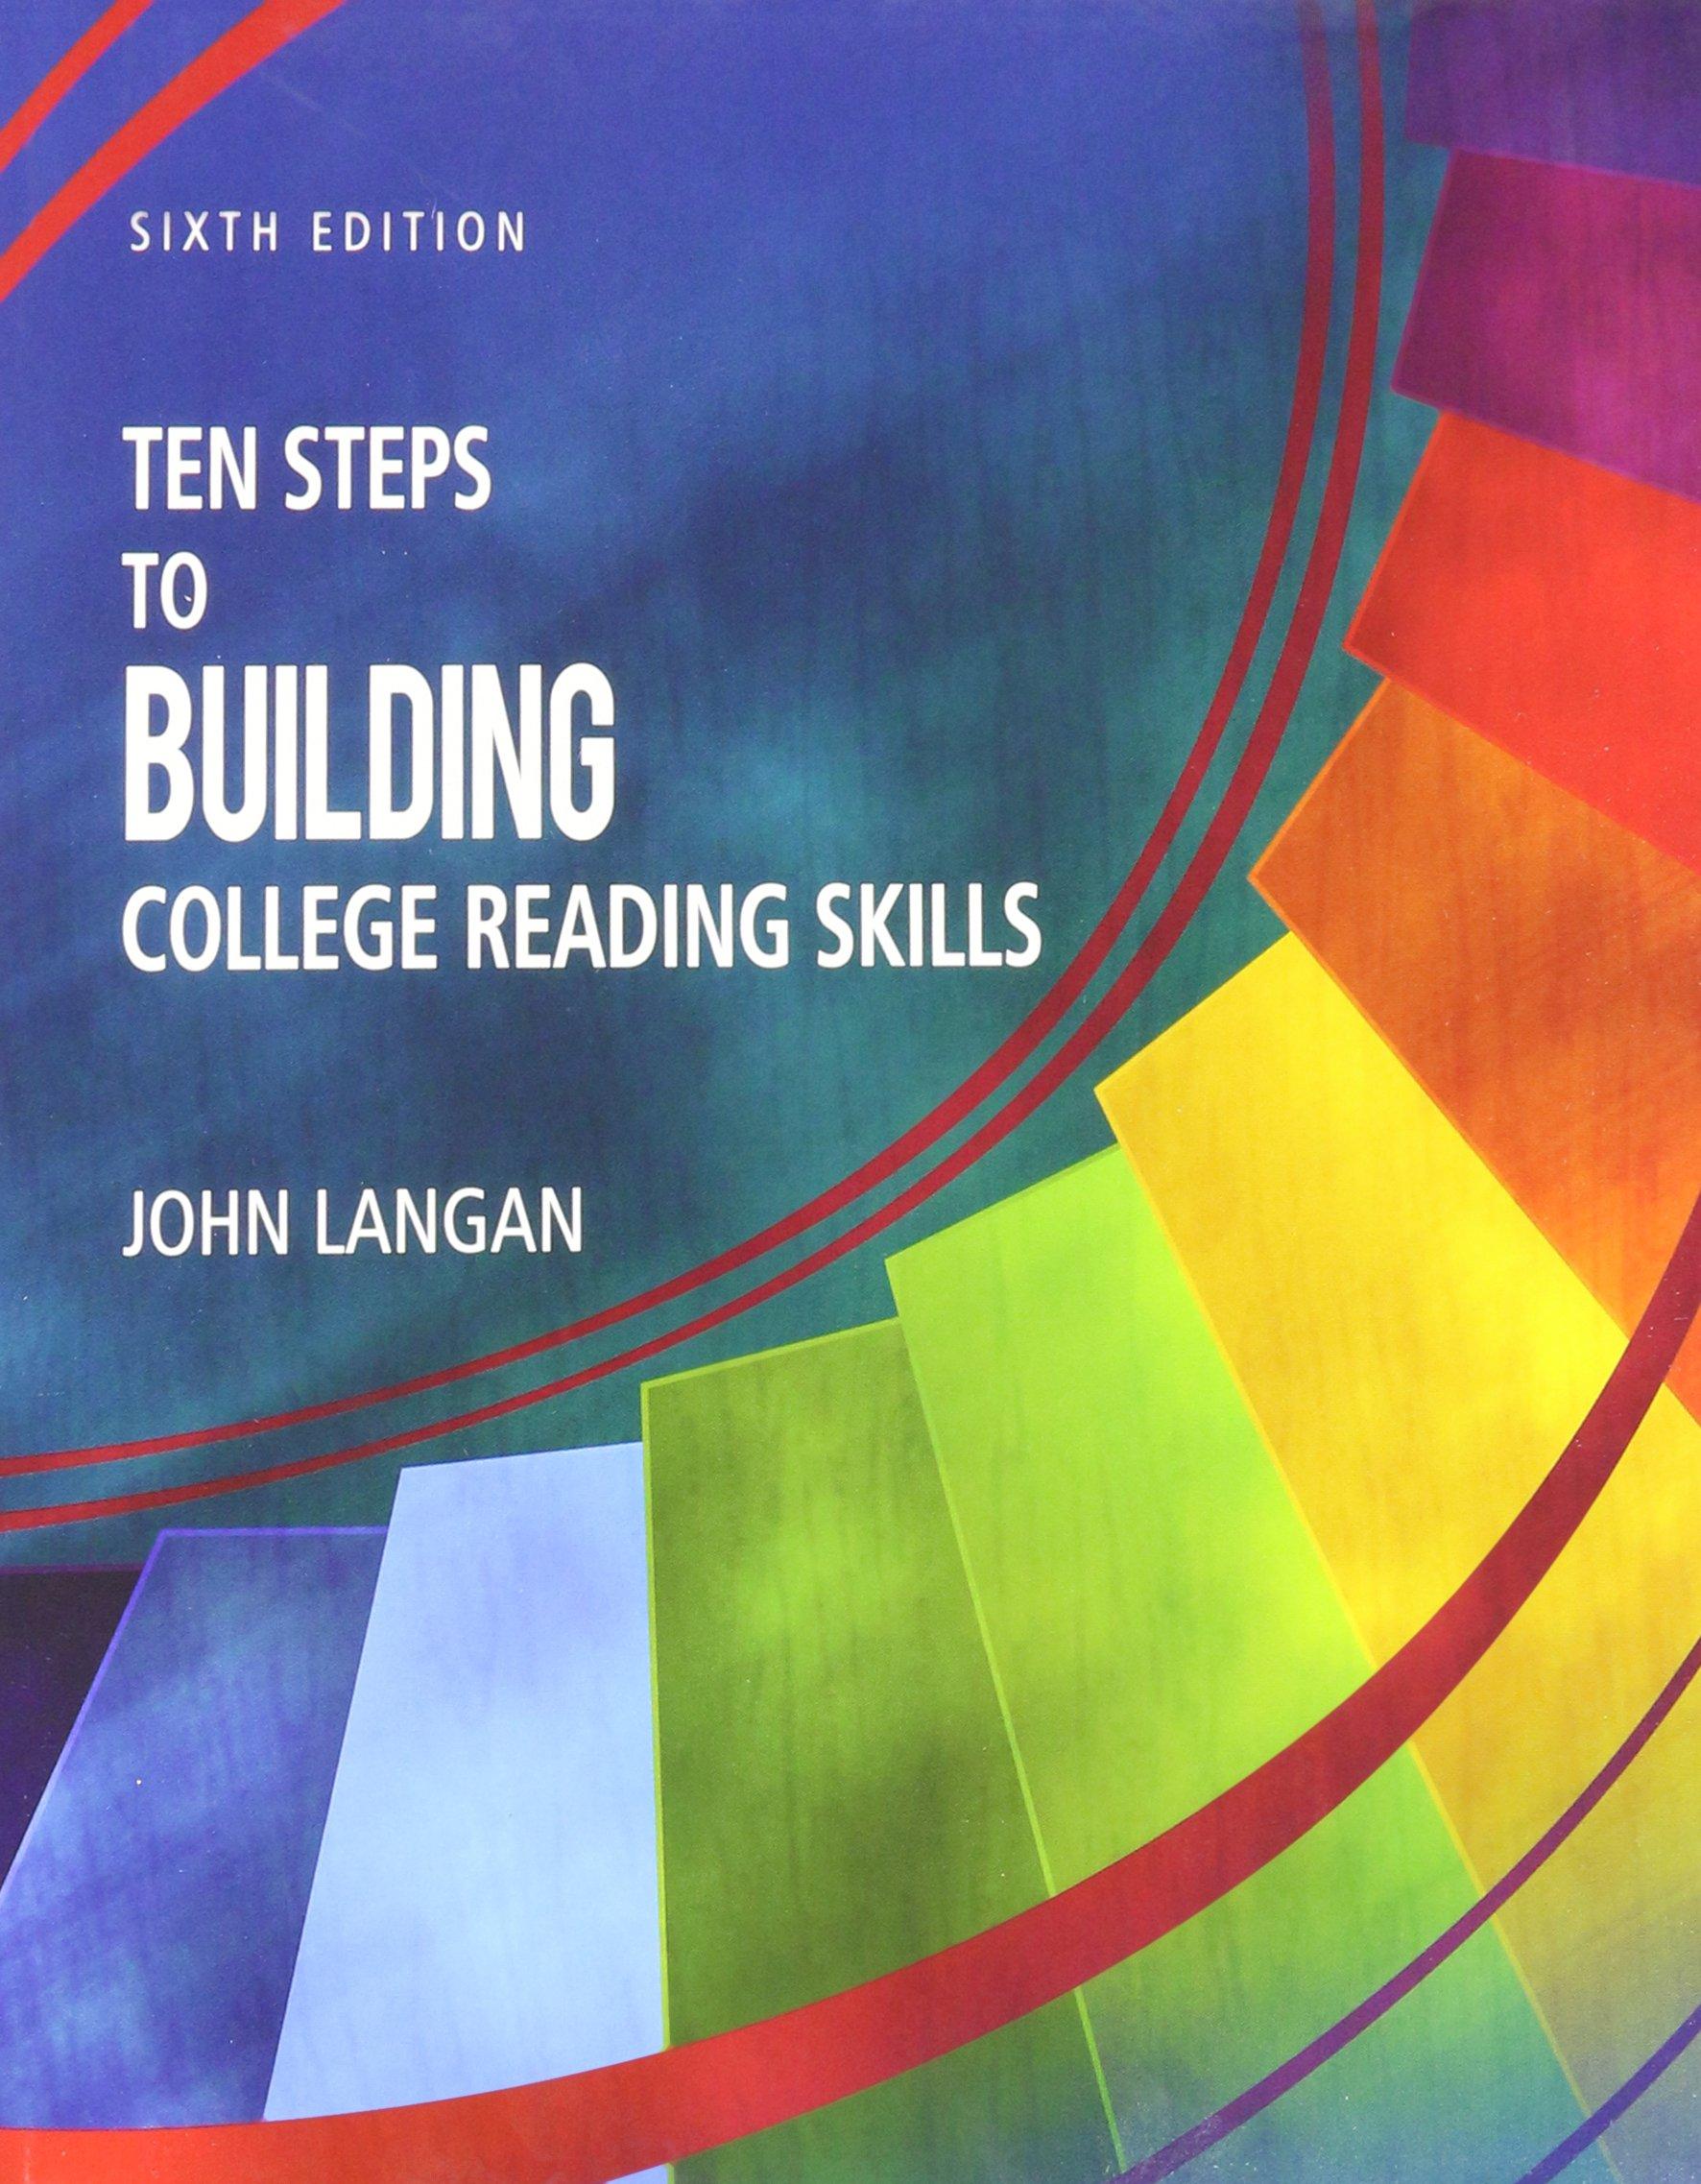 Ten steps to building college reading skills john langan ten steps to building college reading skills john langan 9781591944645 amazon books fandeluxe Choice Image